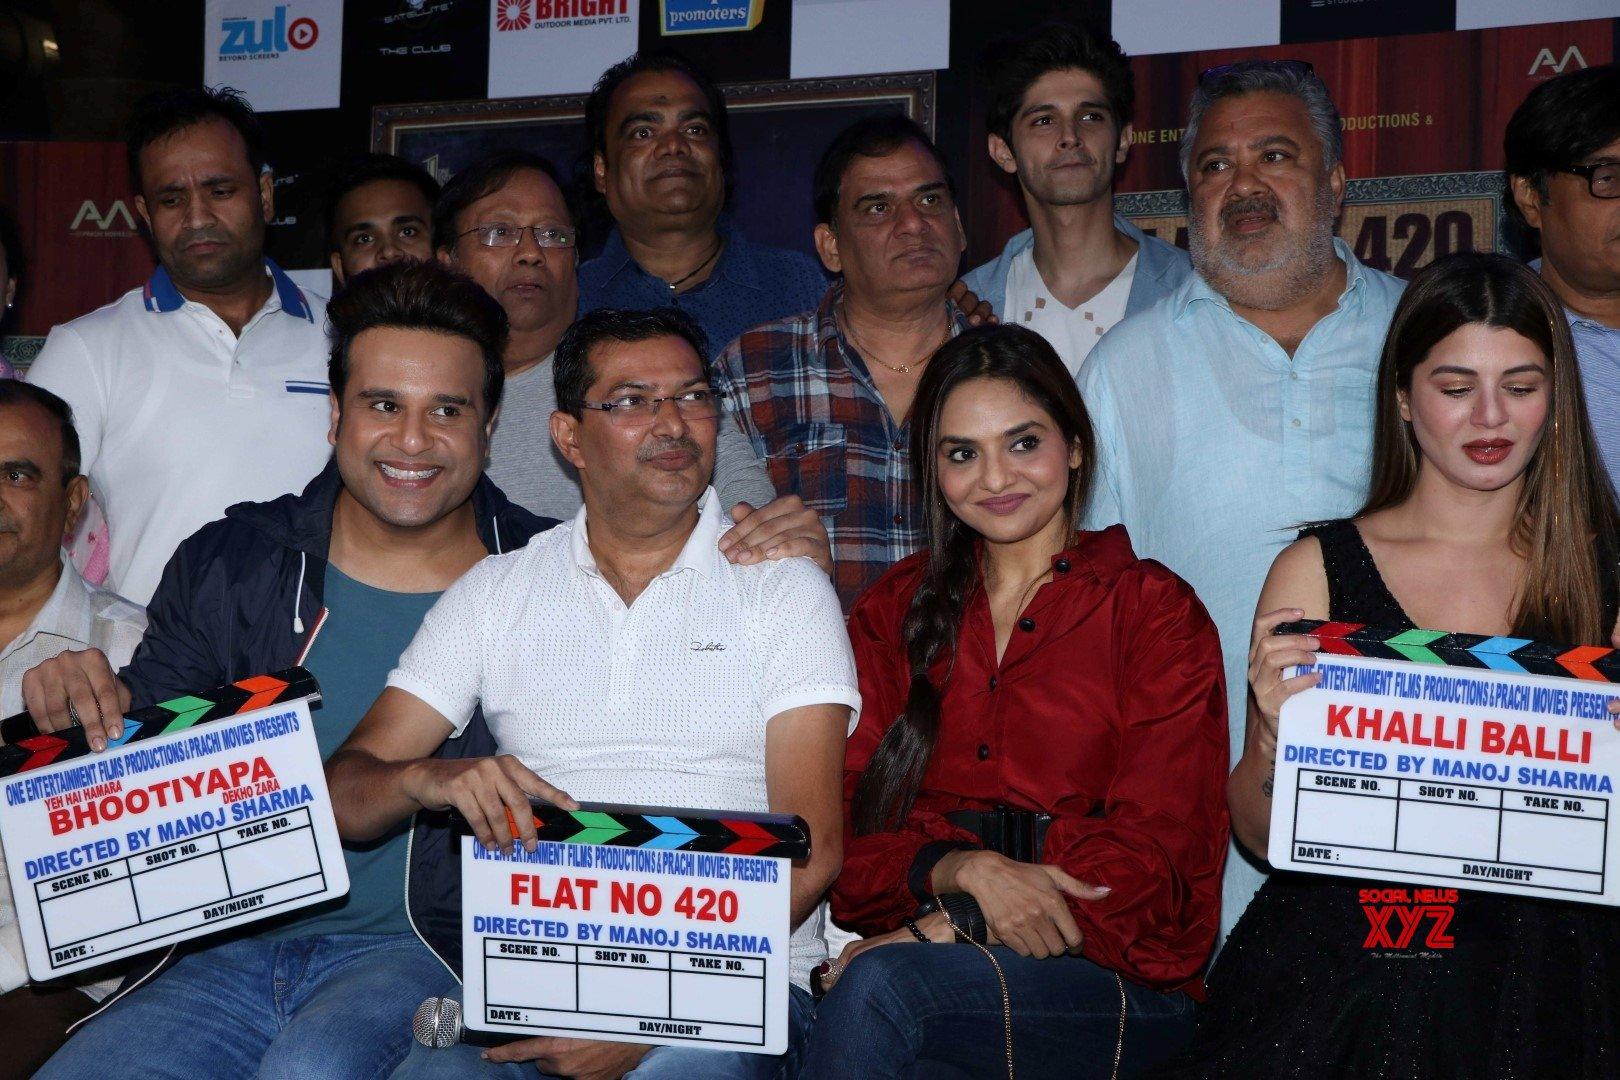 Mumbai: One entertainment film productions and Prachi movies announce 3 films - Khalli Balli, Bhutiyapa and Flat No 420 #Gallery